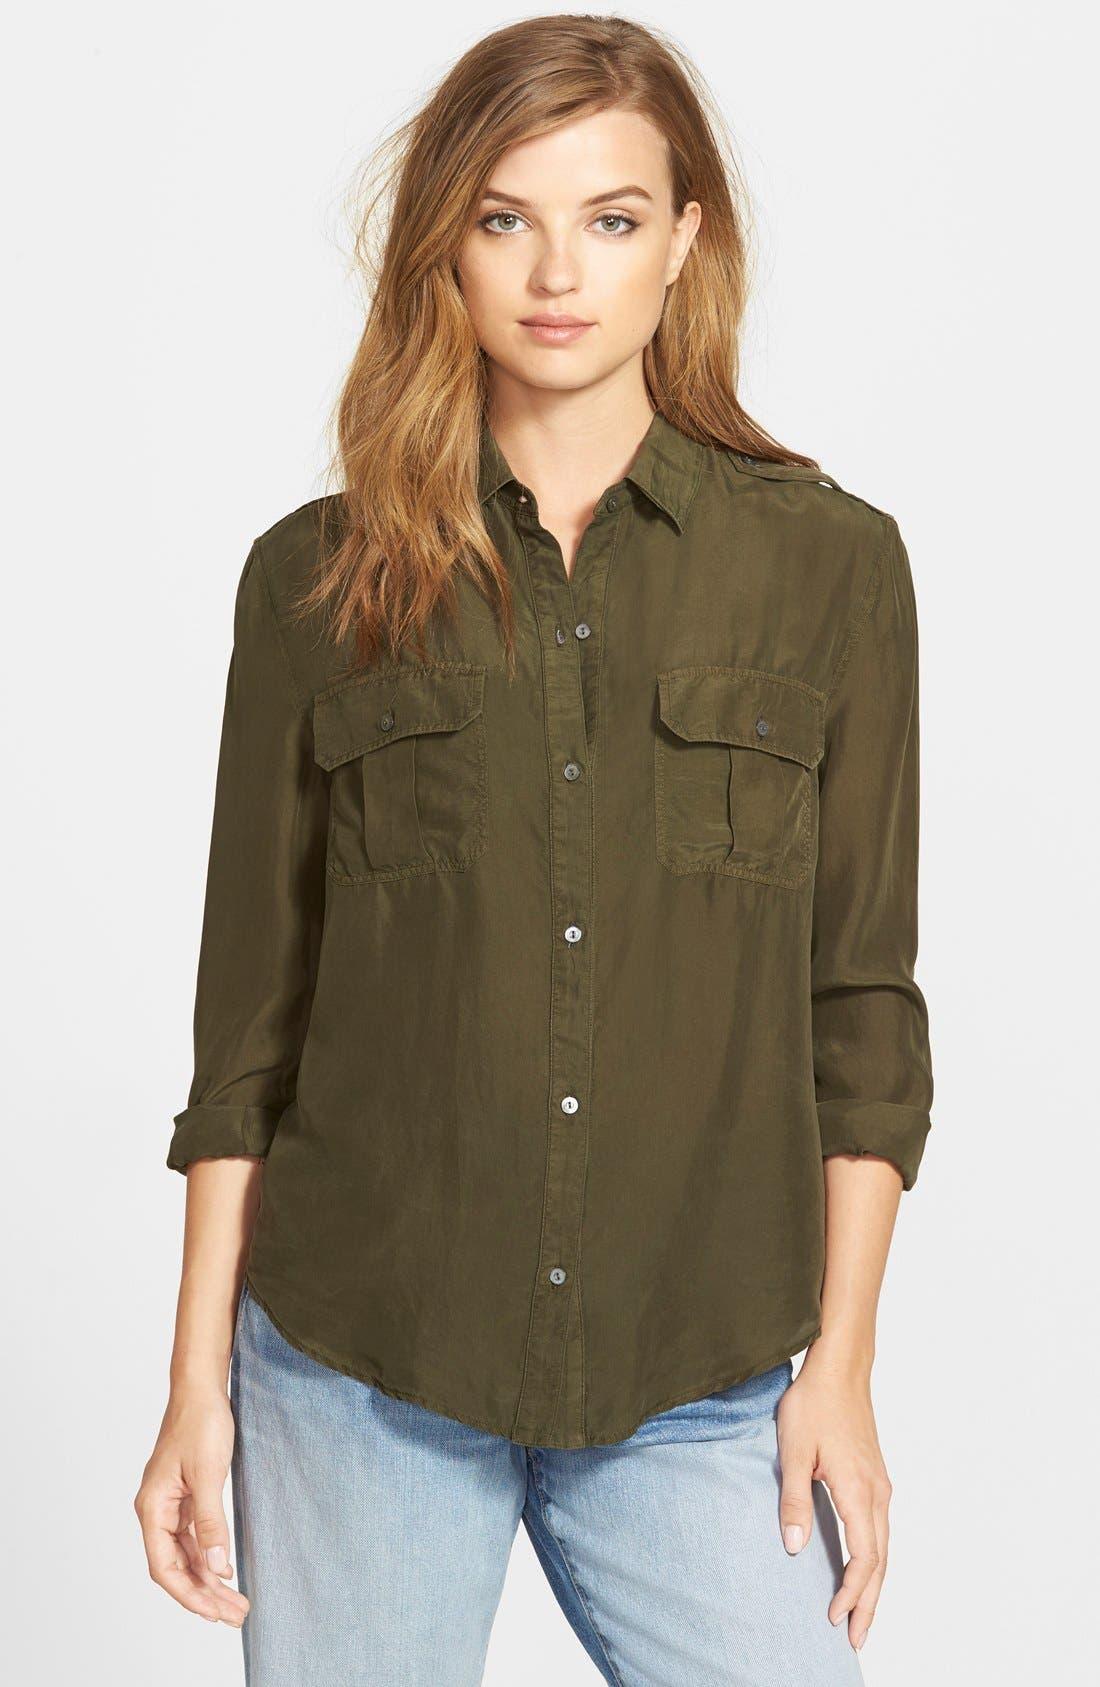 Alternate Image 1 Selected - J Brand Ready-To-Wear 'Edie' Silk Shirt